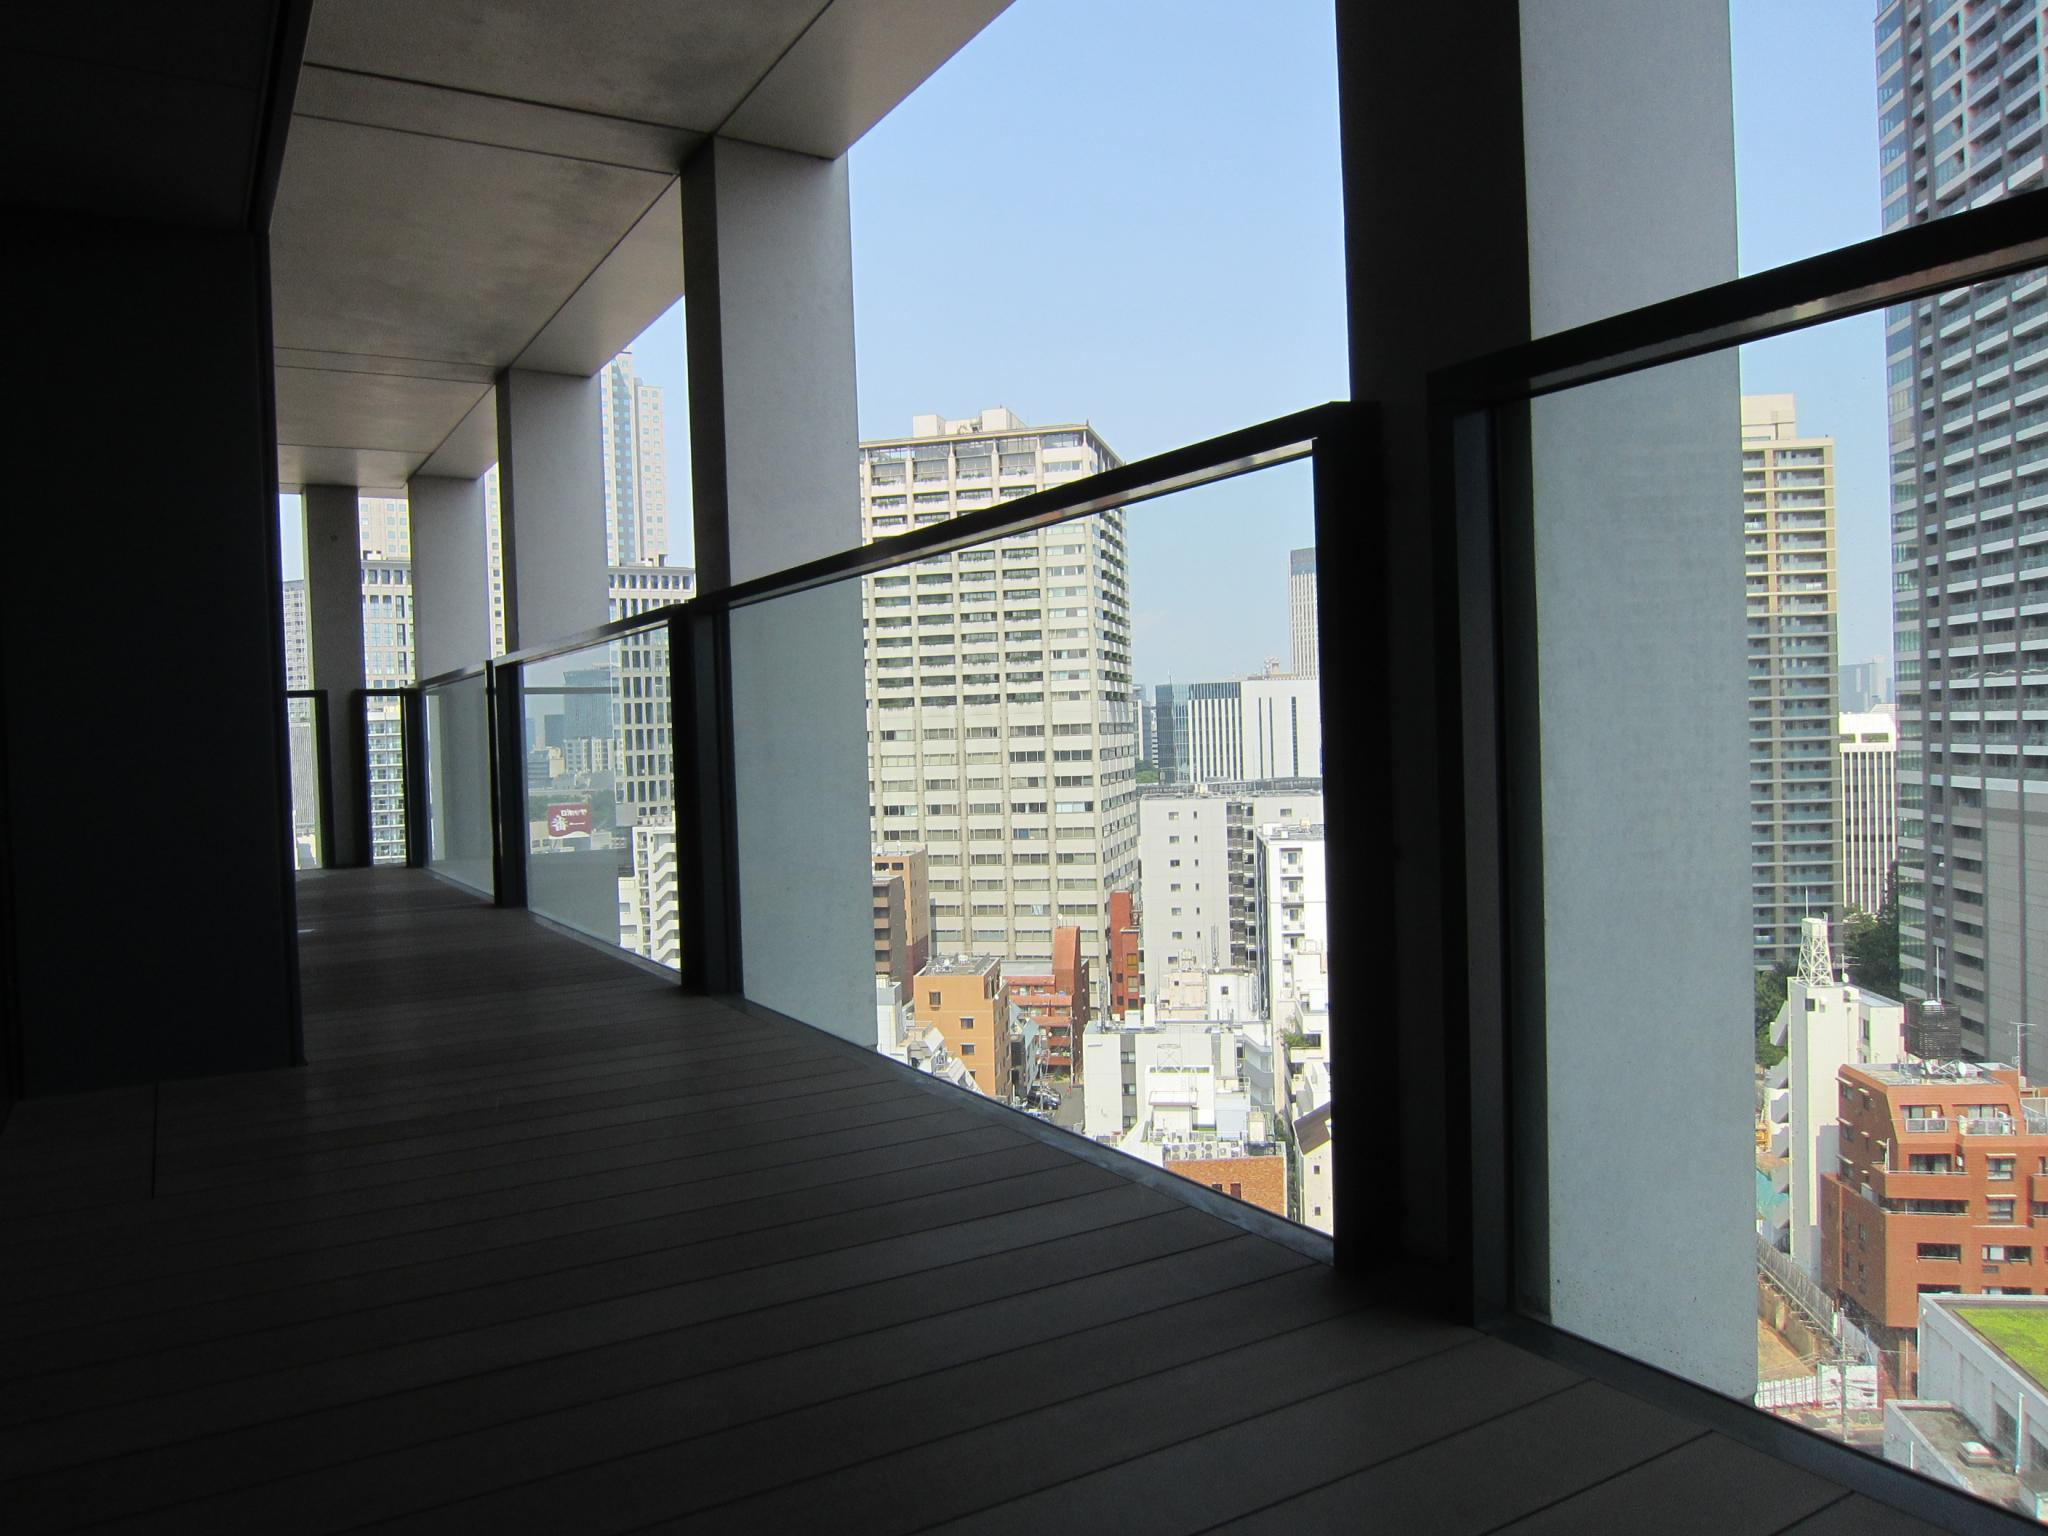 3LDK Apartment - Akasaka - Minato-ku - Tokyo - Japan - For ...